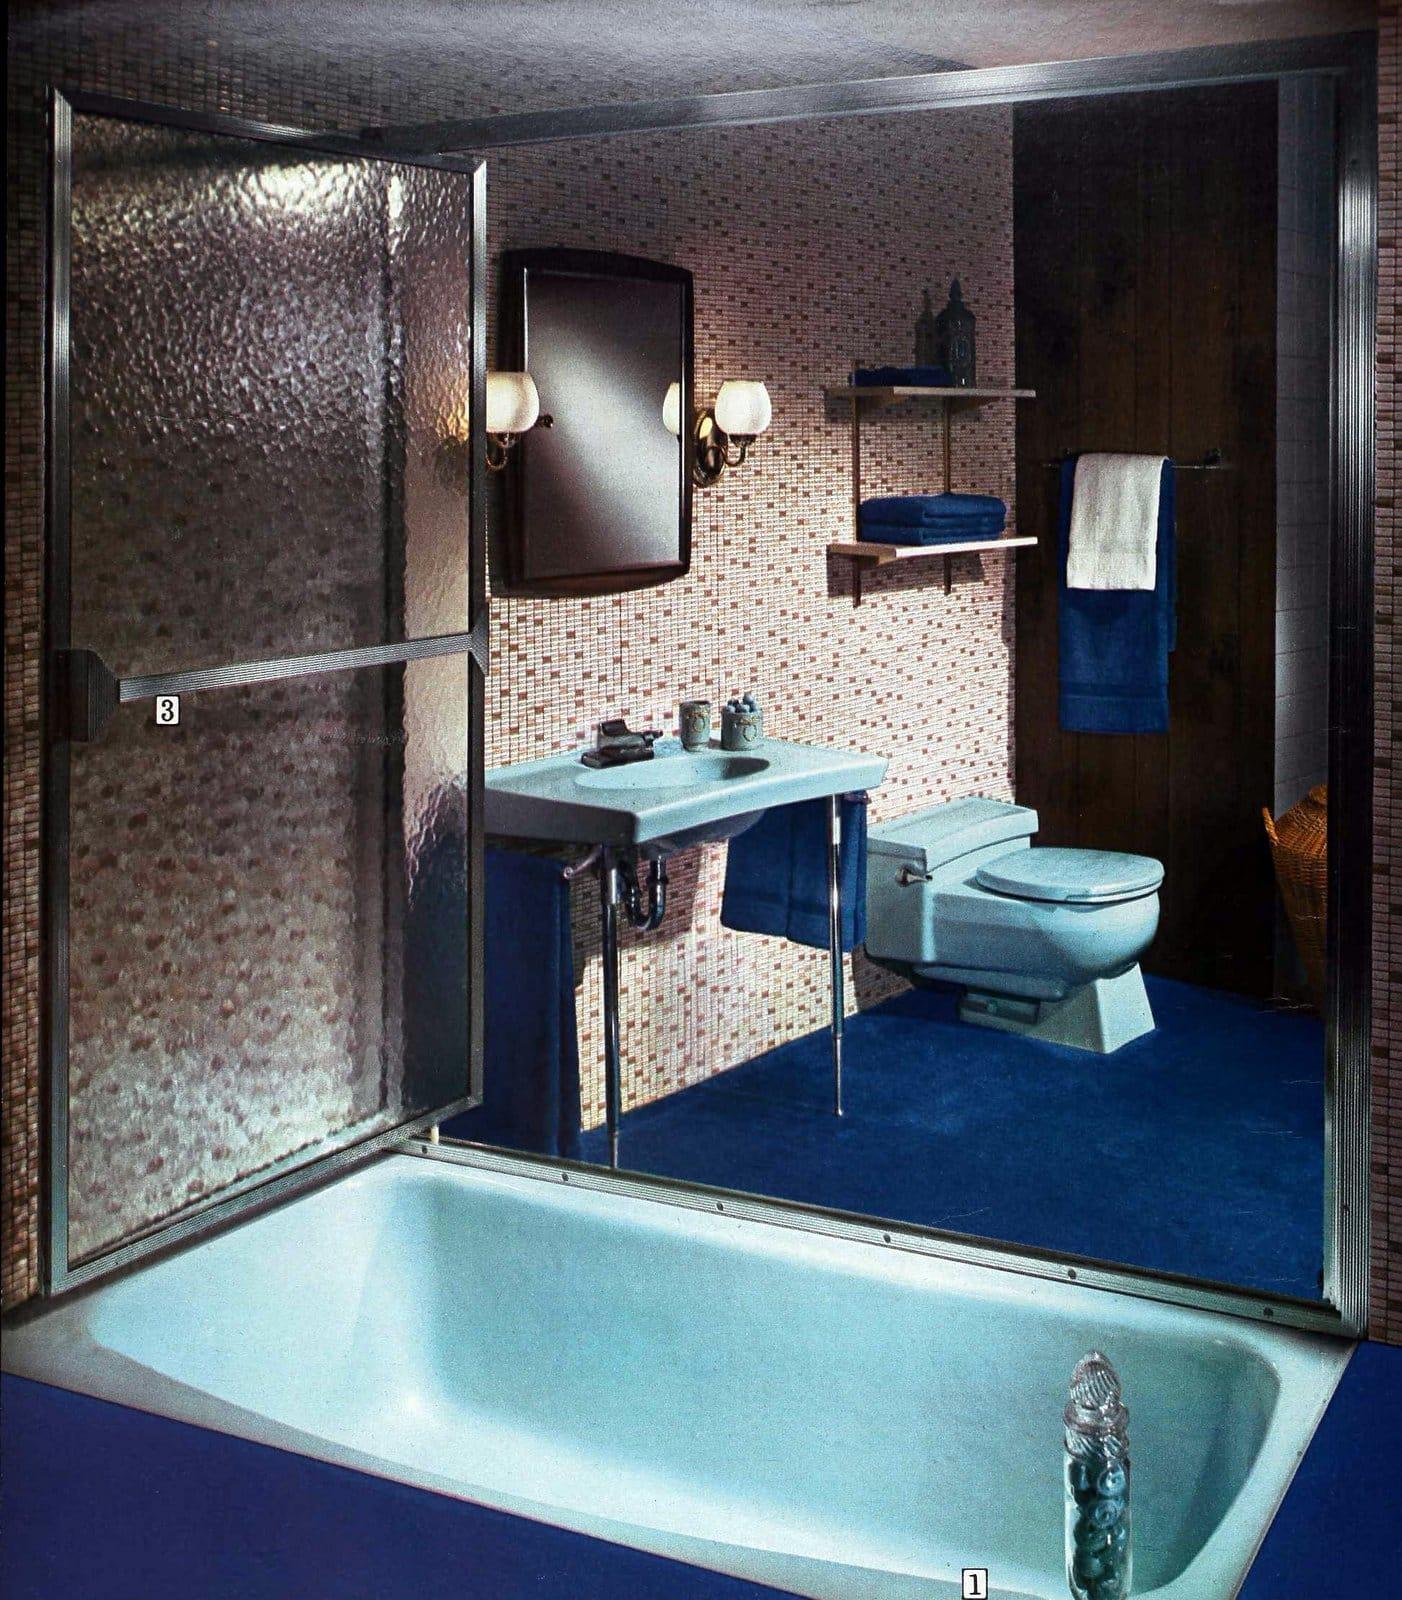 Light blue vintage bath fixtures with mosaic tile walls and dark blue carpet (1966)